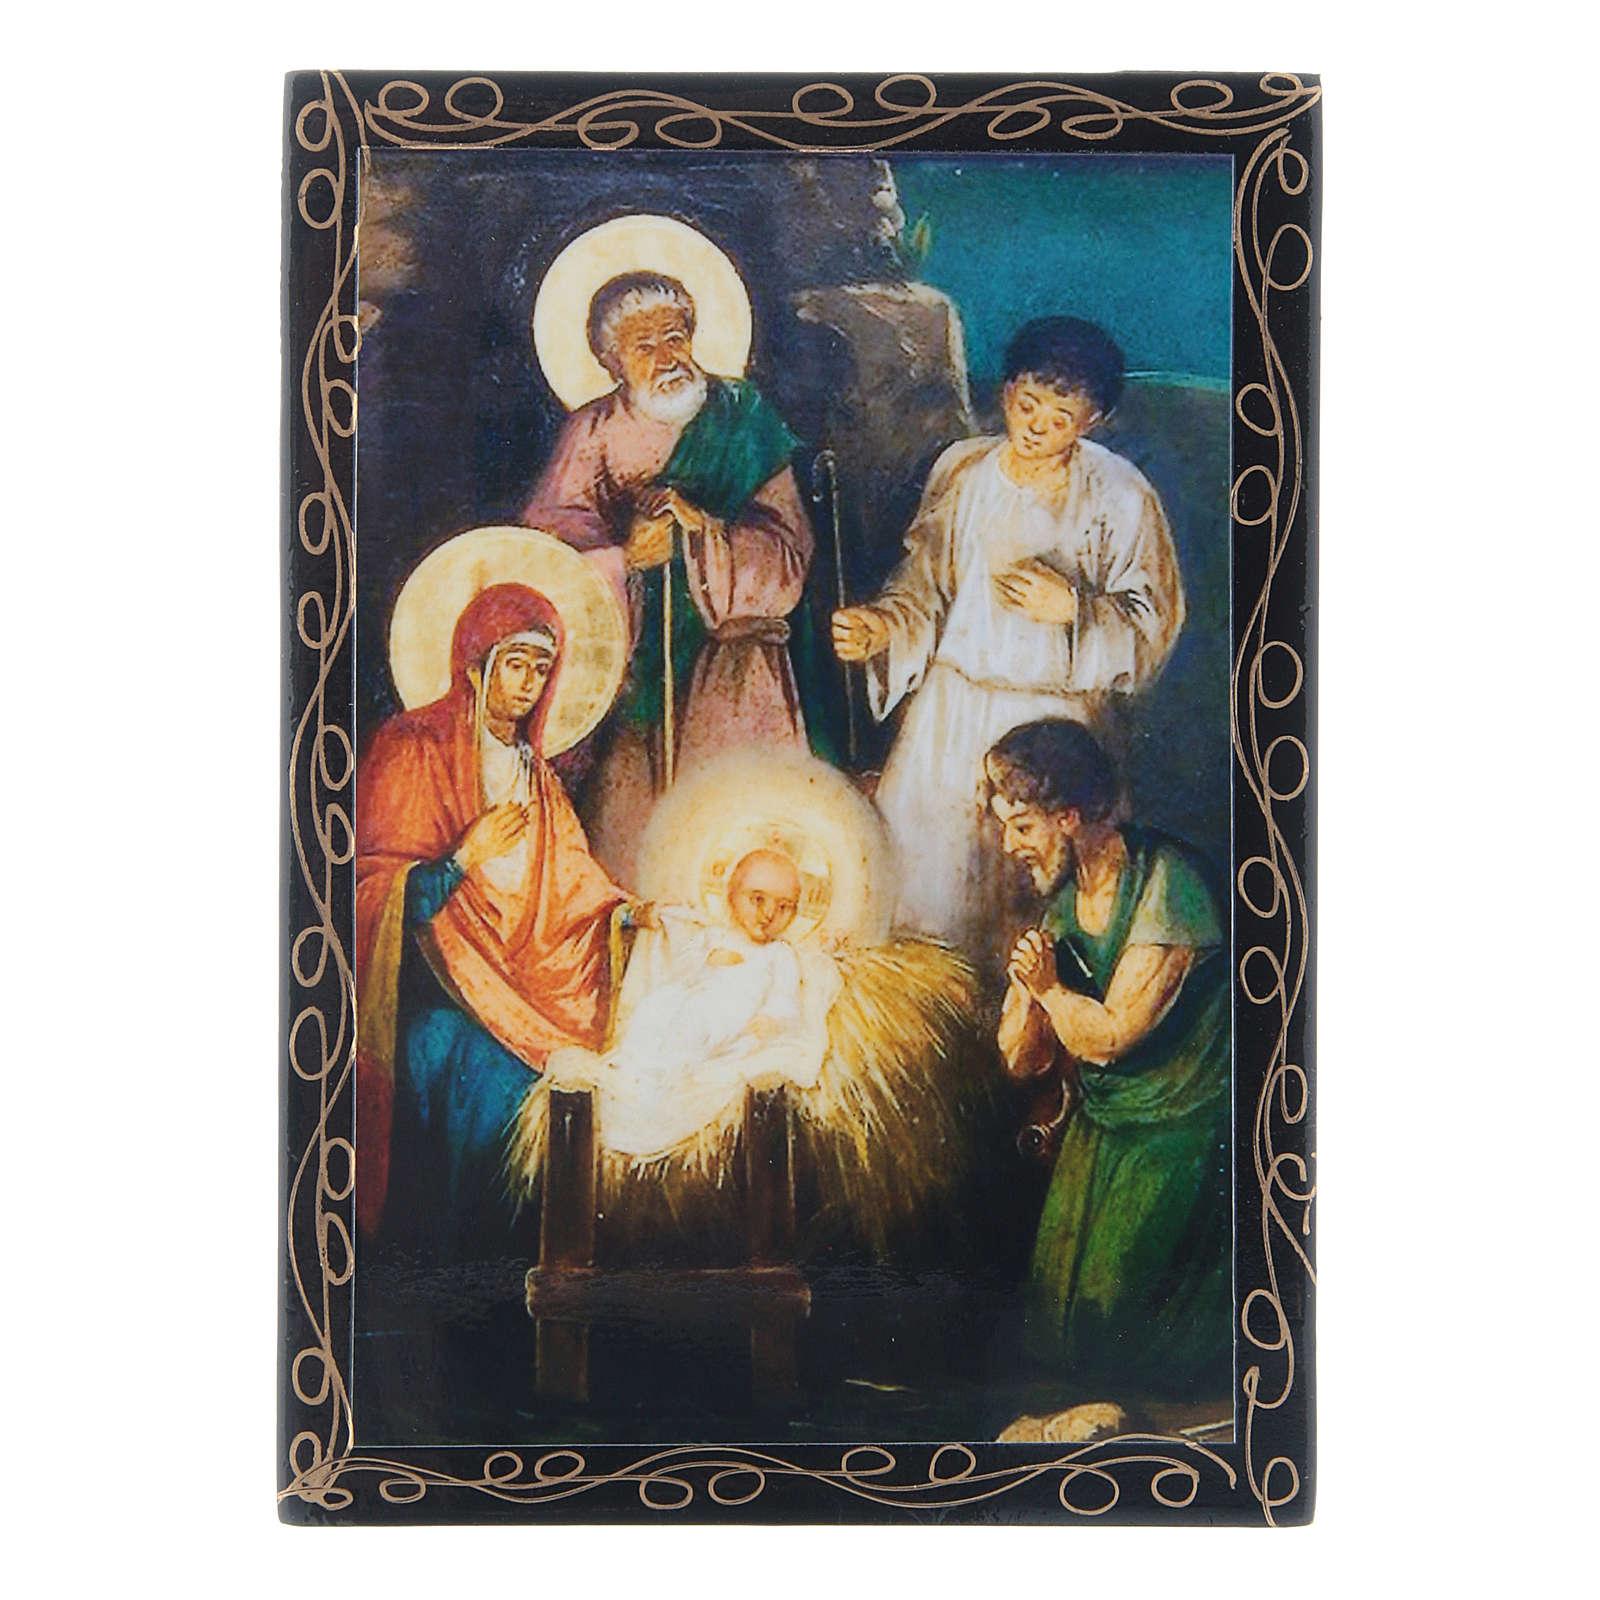 Russian papier-mâché and lacquer painted box The Nativity of Jesus Christ 14x10 cm 4